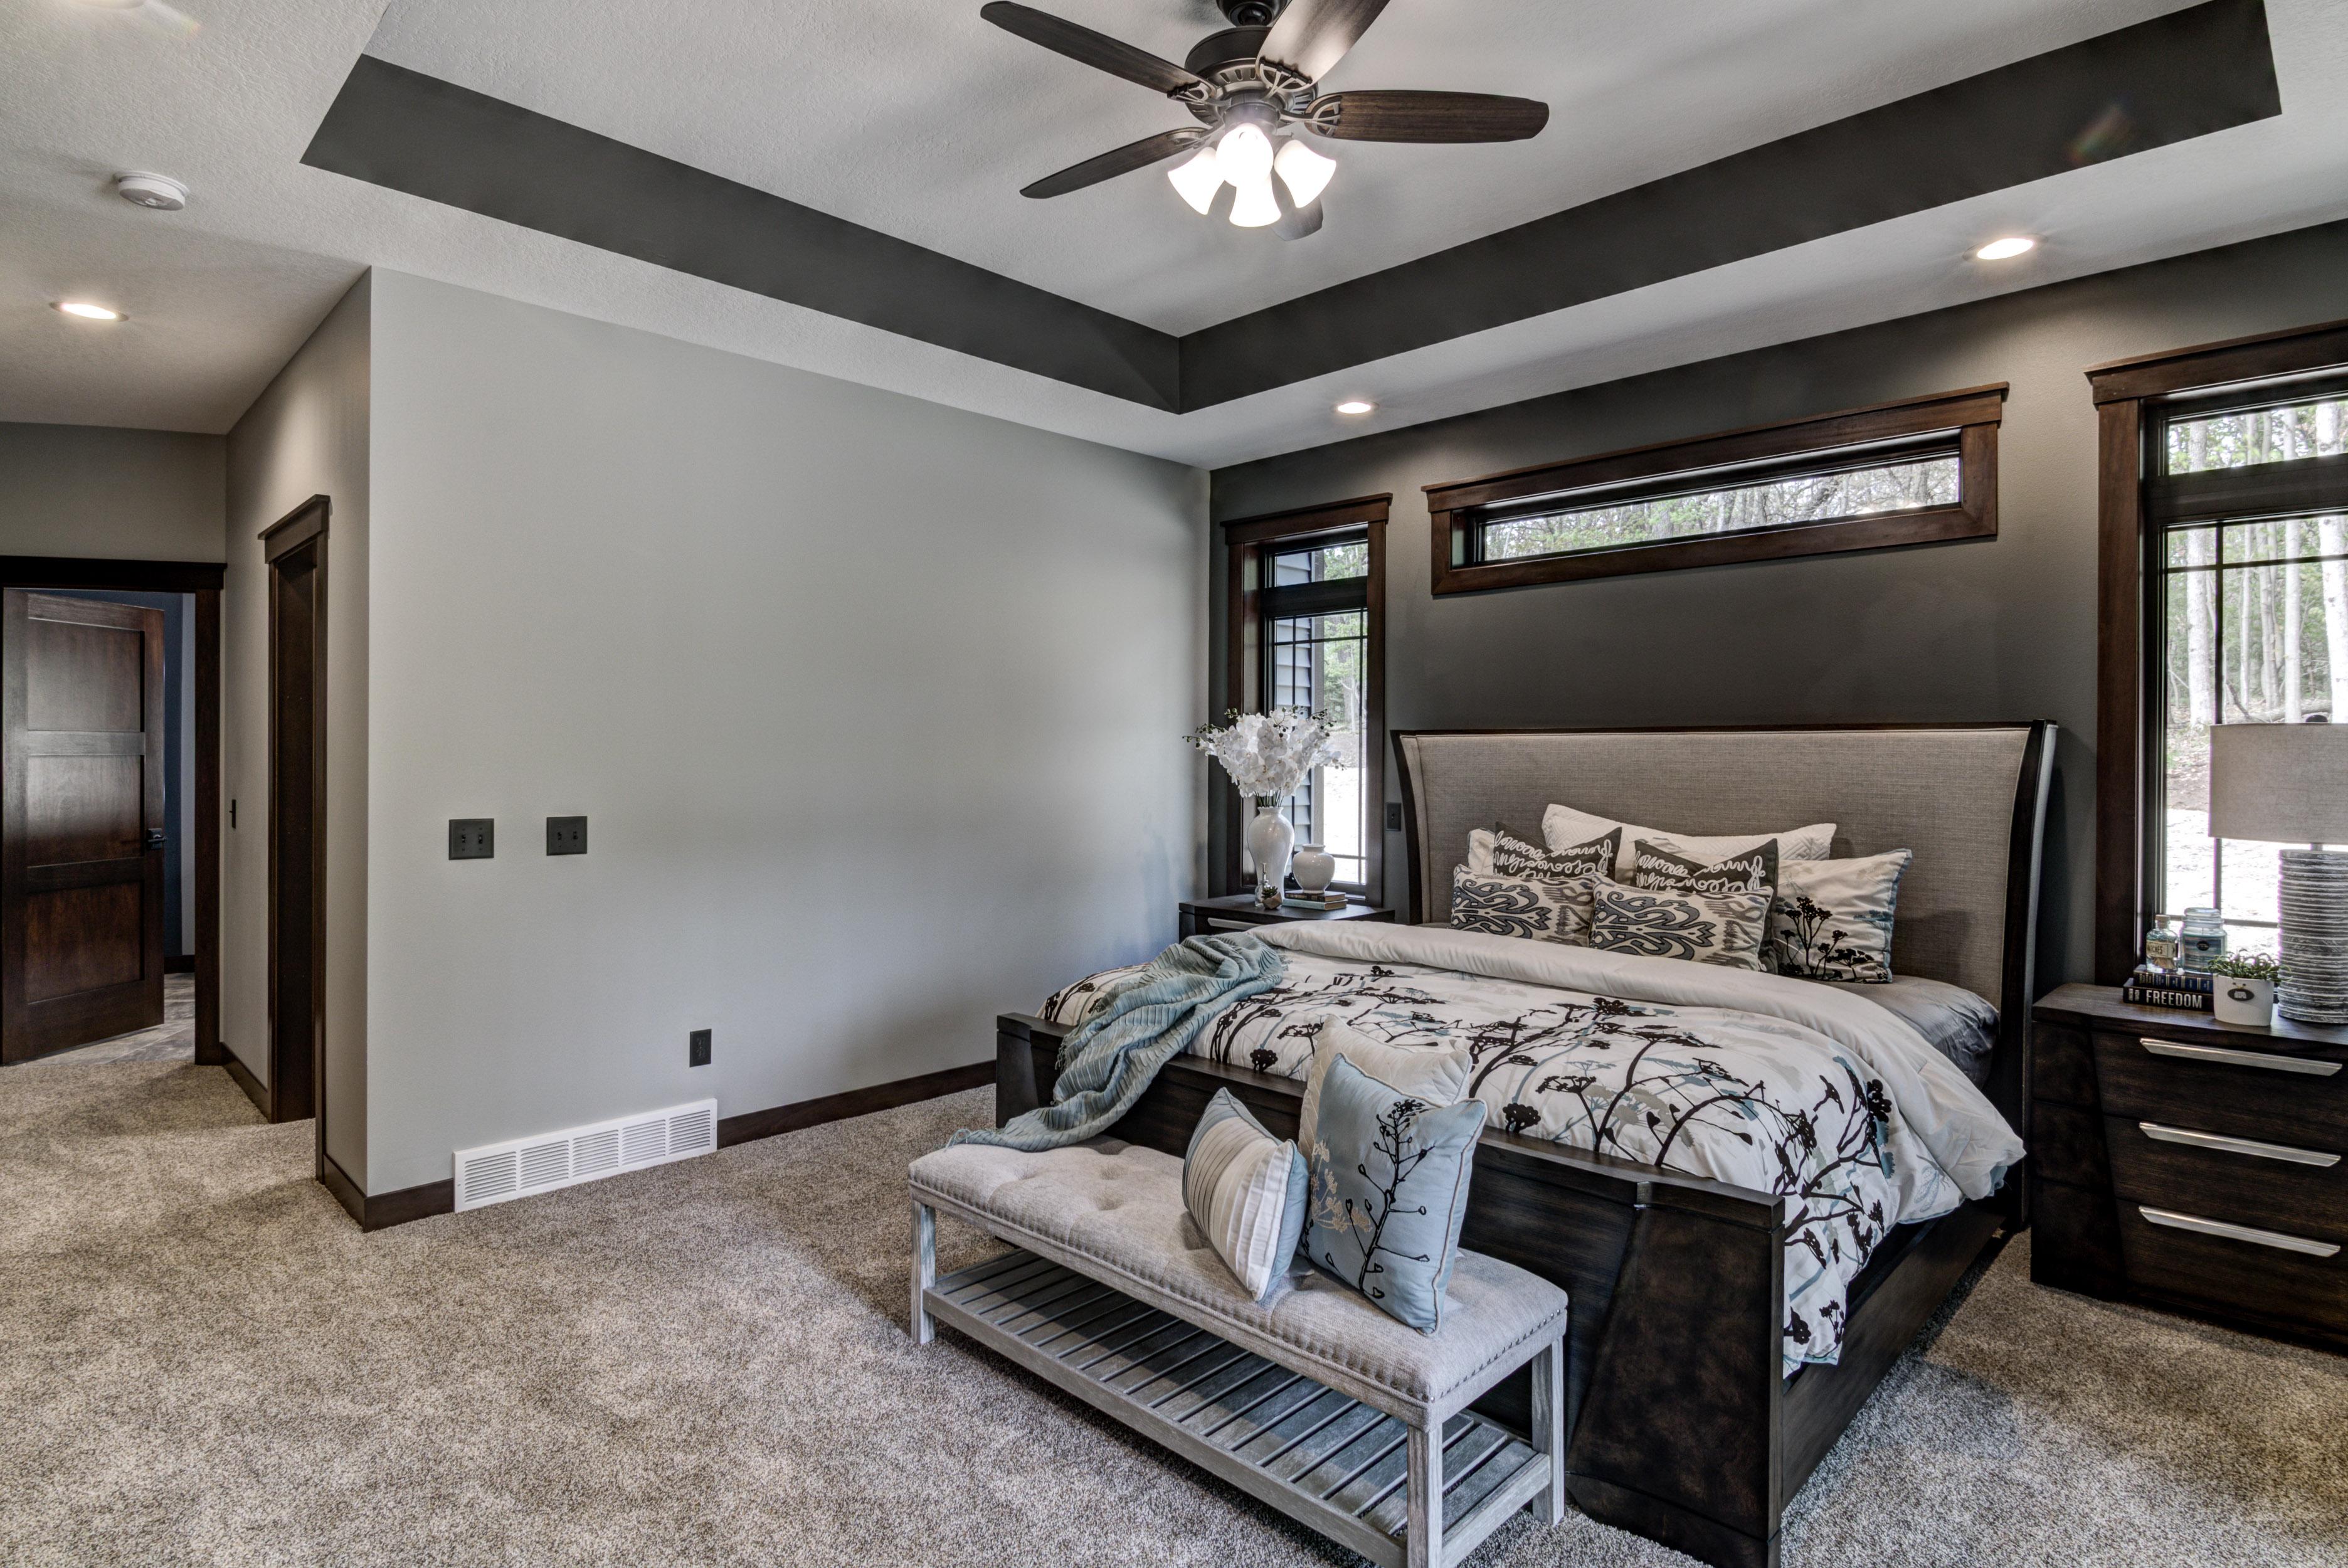 24-06 - Master Bedroom-2